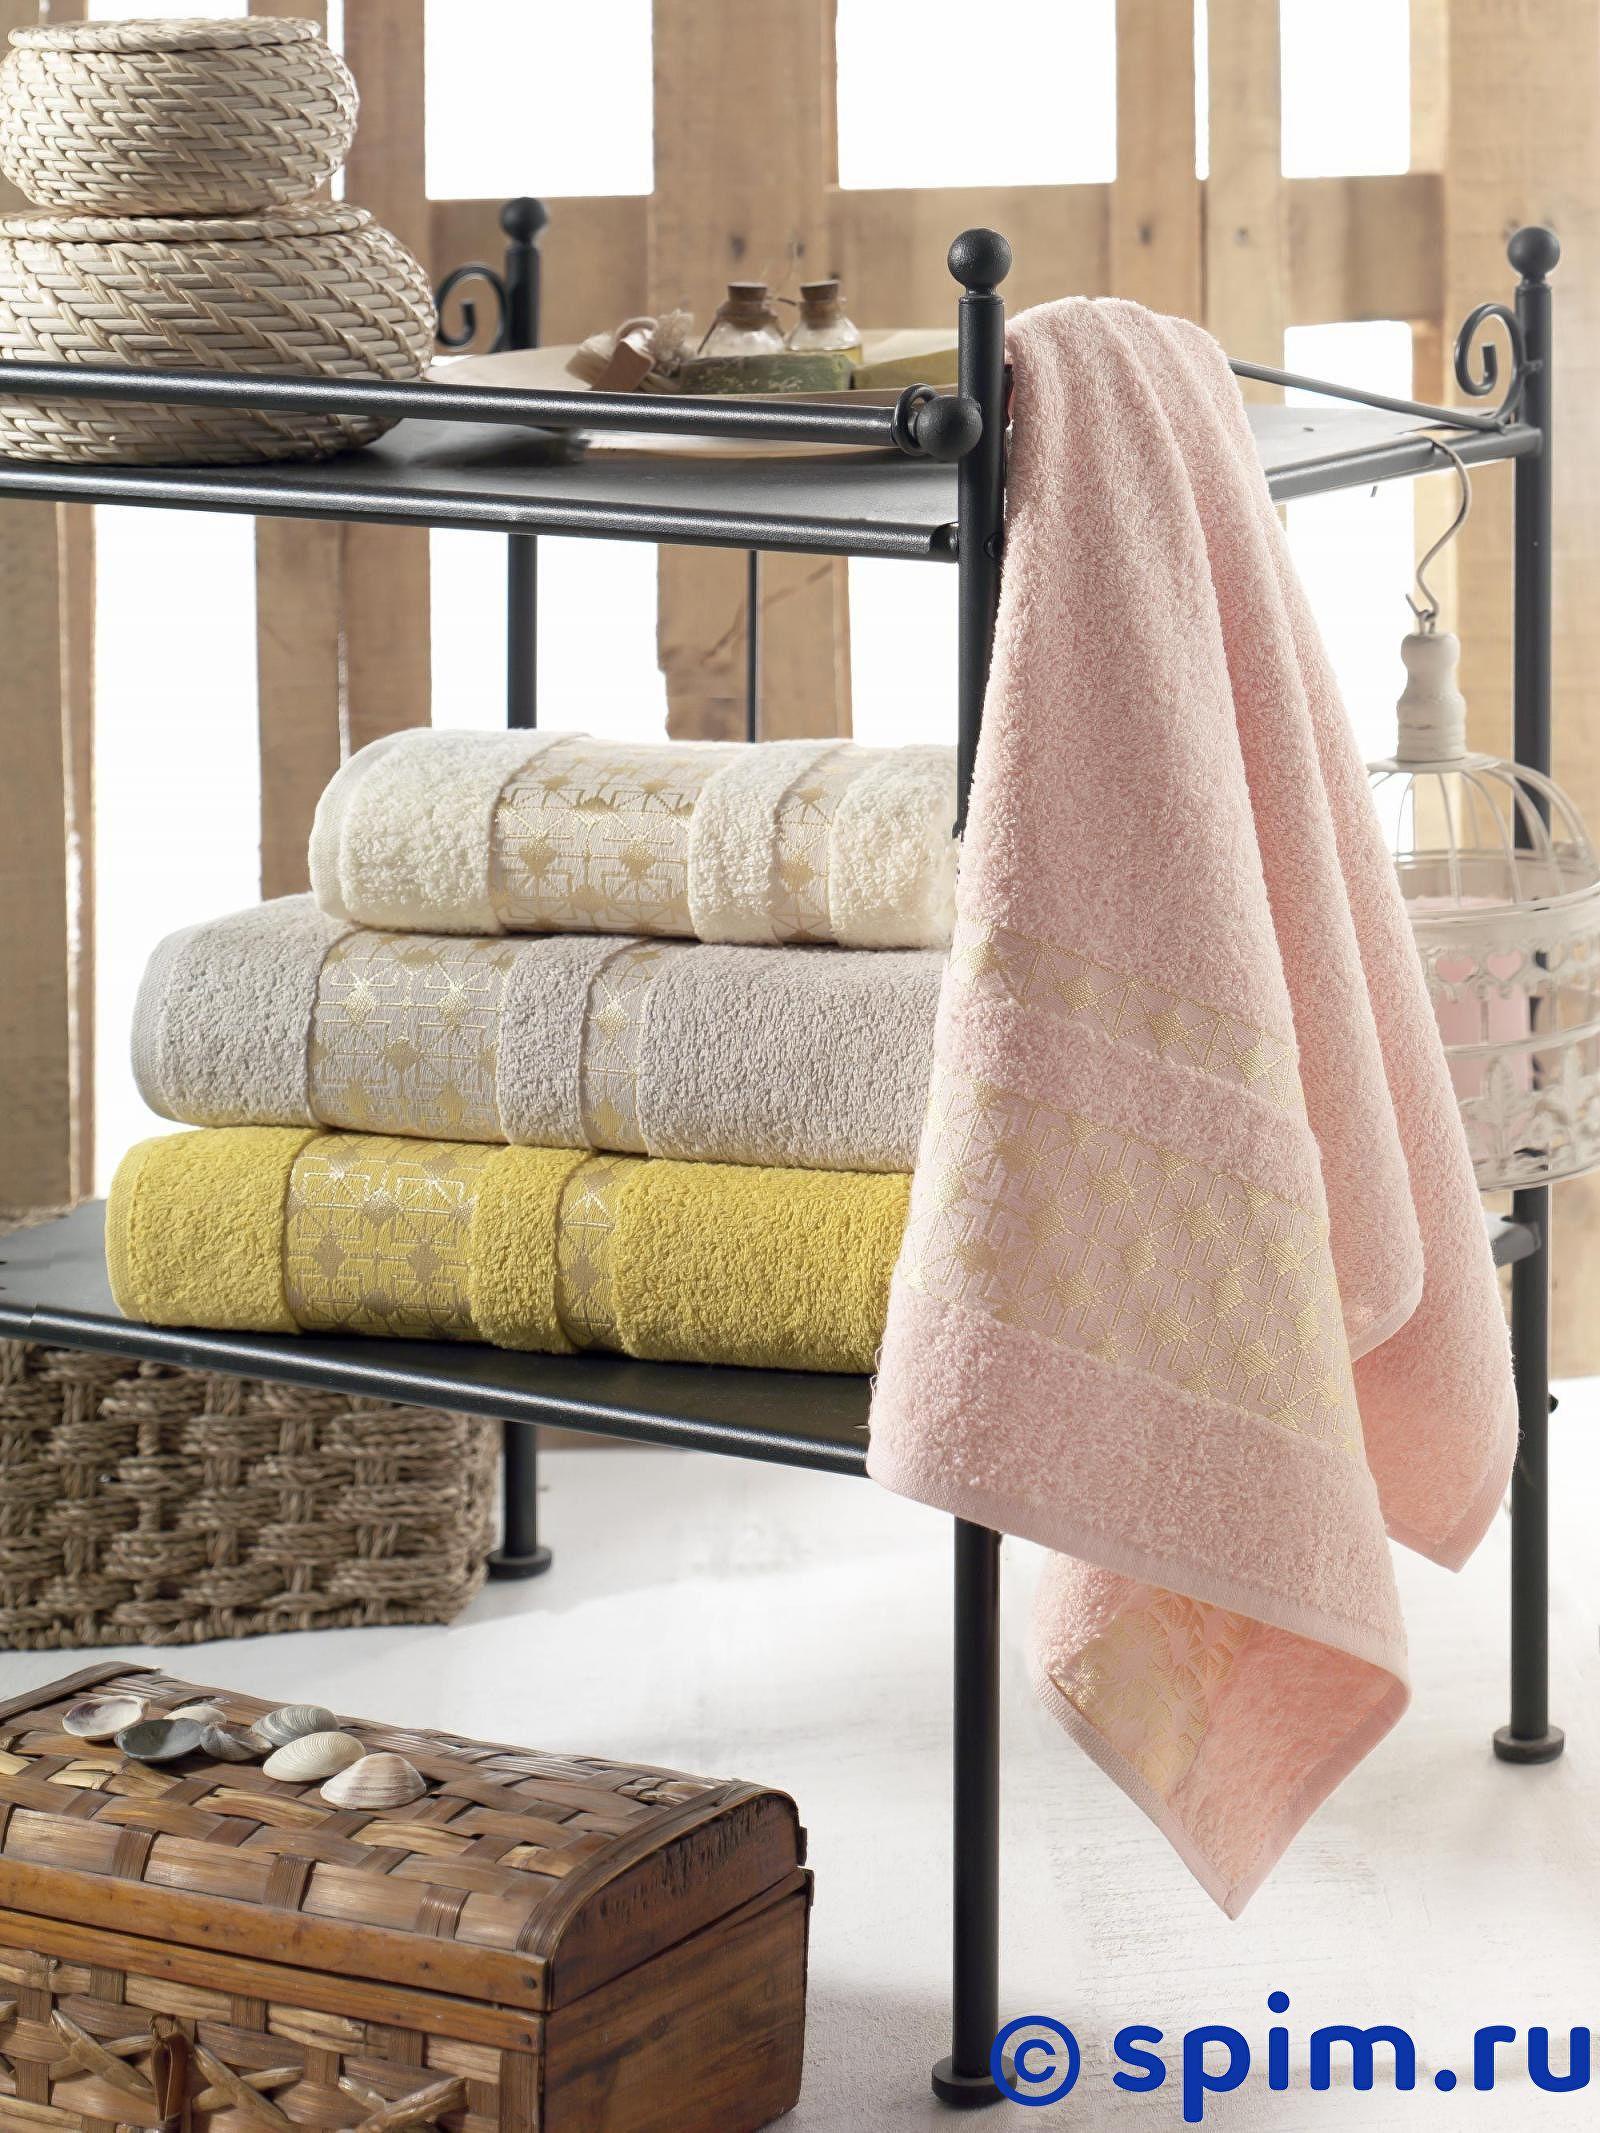 Набор из 4-х полотенец Do&co Oriental 50х90 см полотенца do n co полотенце lady цвет мятный набор